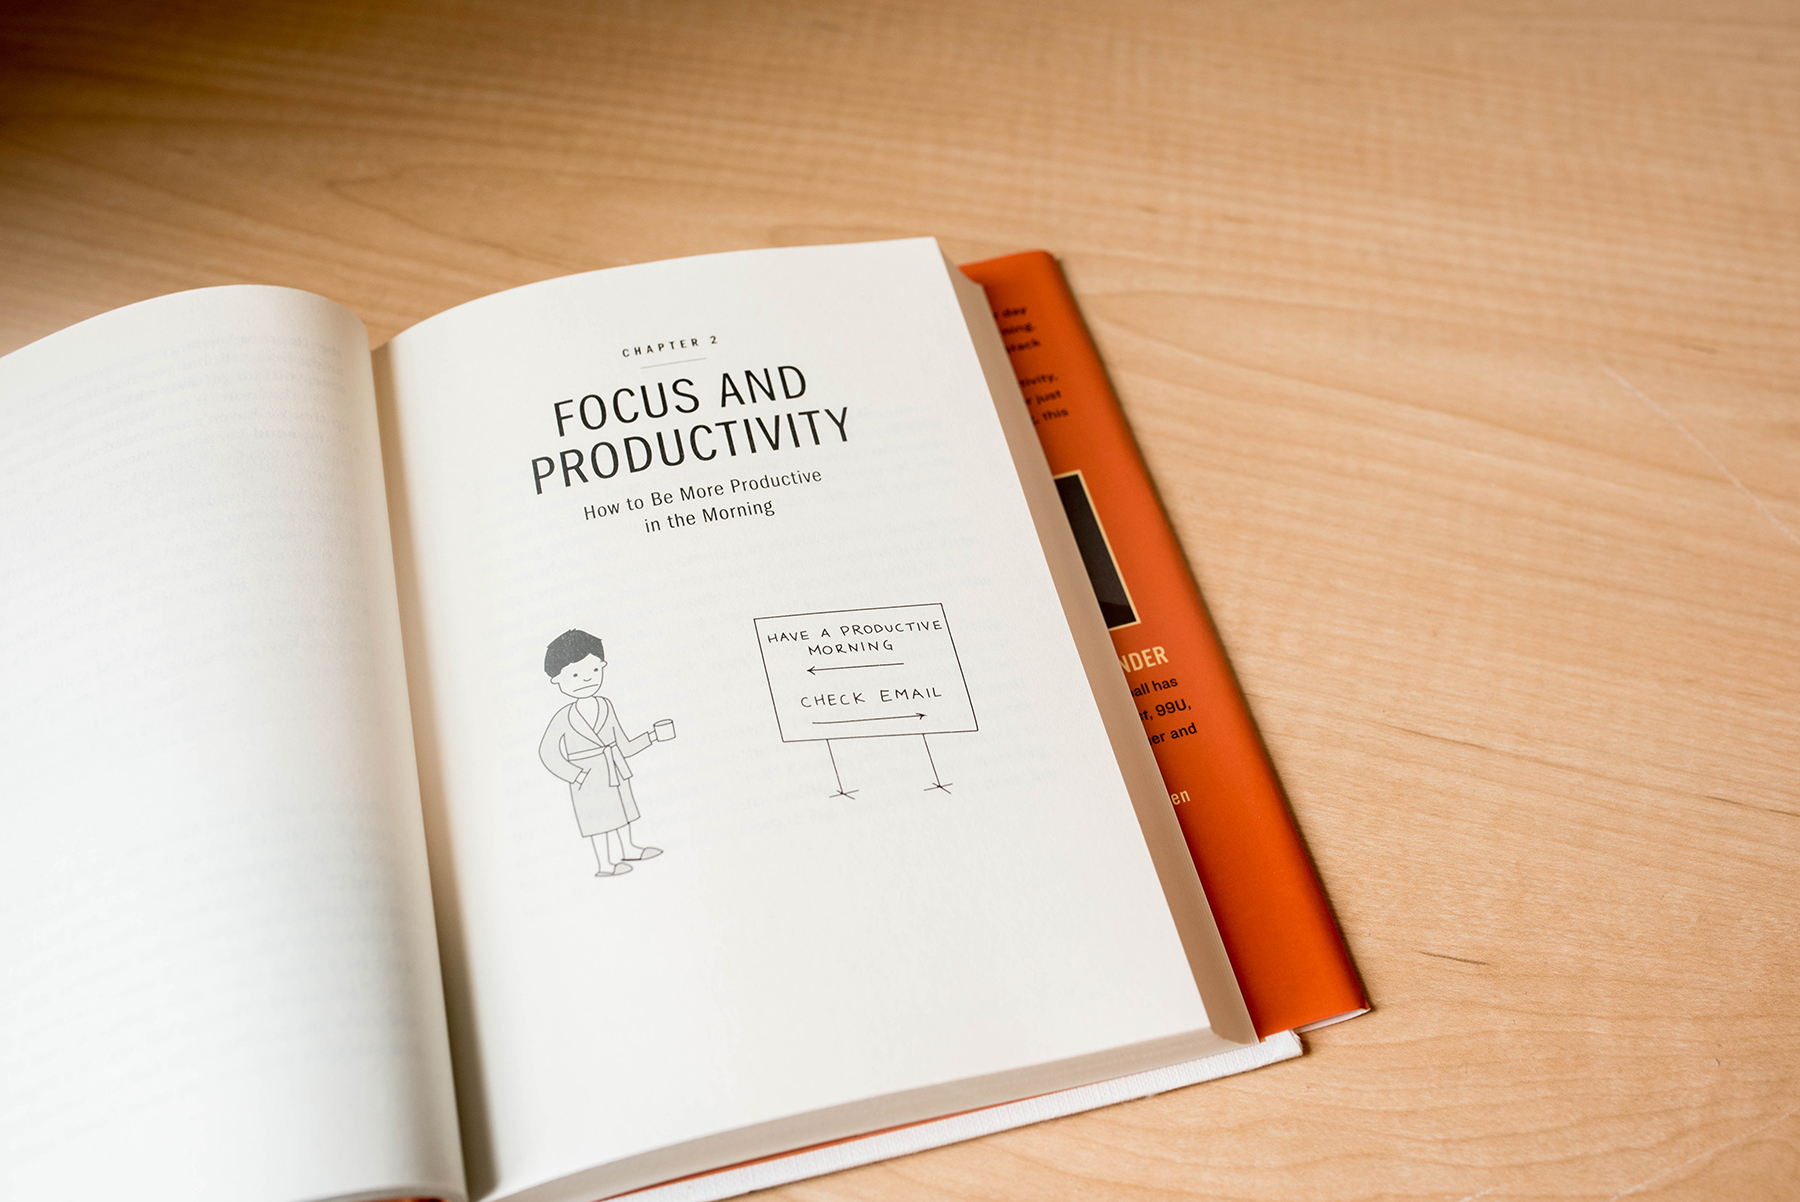 Focus - My Morning Routine Book Review - Benjamin Spall - Michael Xander - FilterGrade